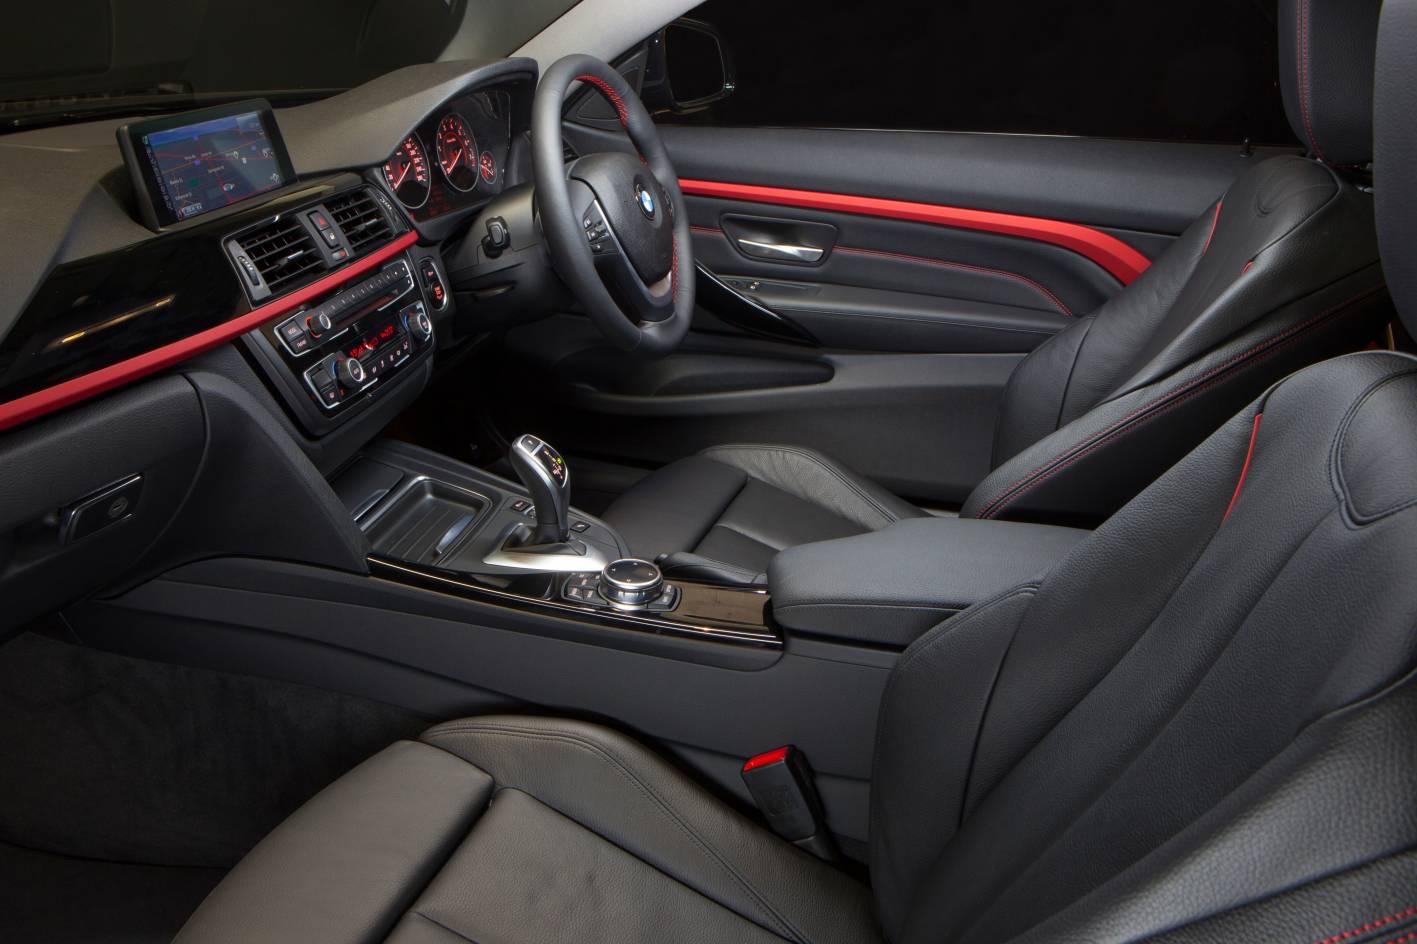 2013 bmw 428i vs 2013 mercedes benz e250 coupe comparison test -  Bmw 4 Series Coupe Test Drive